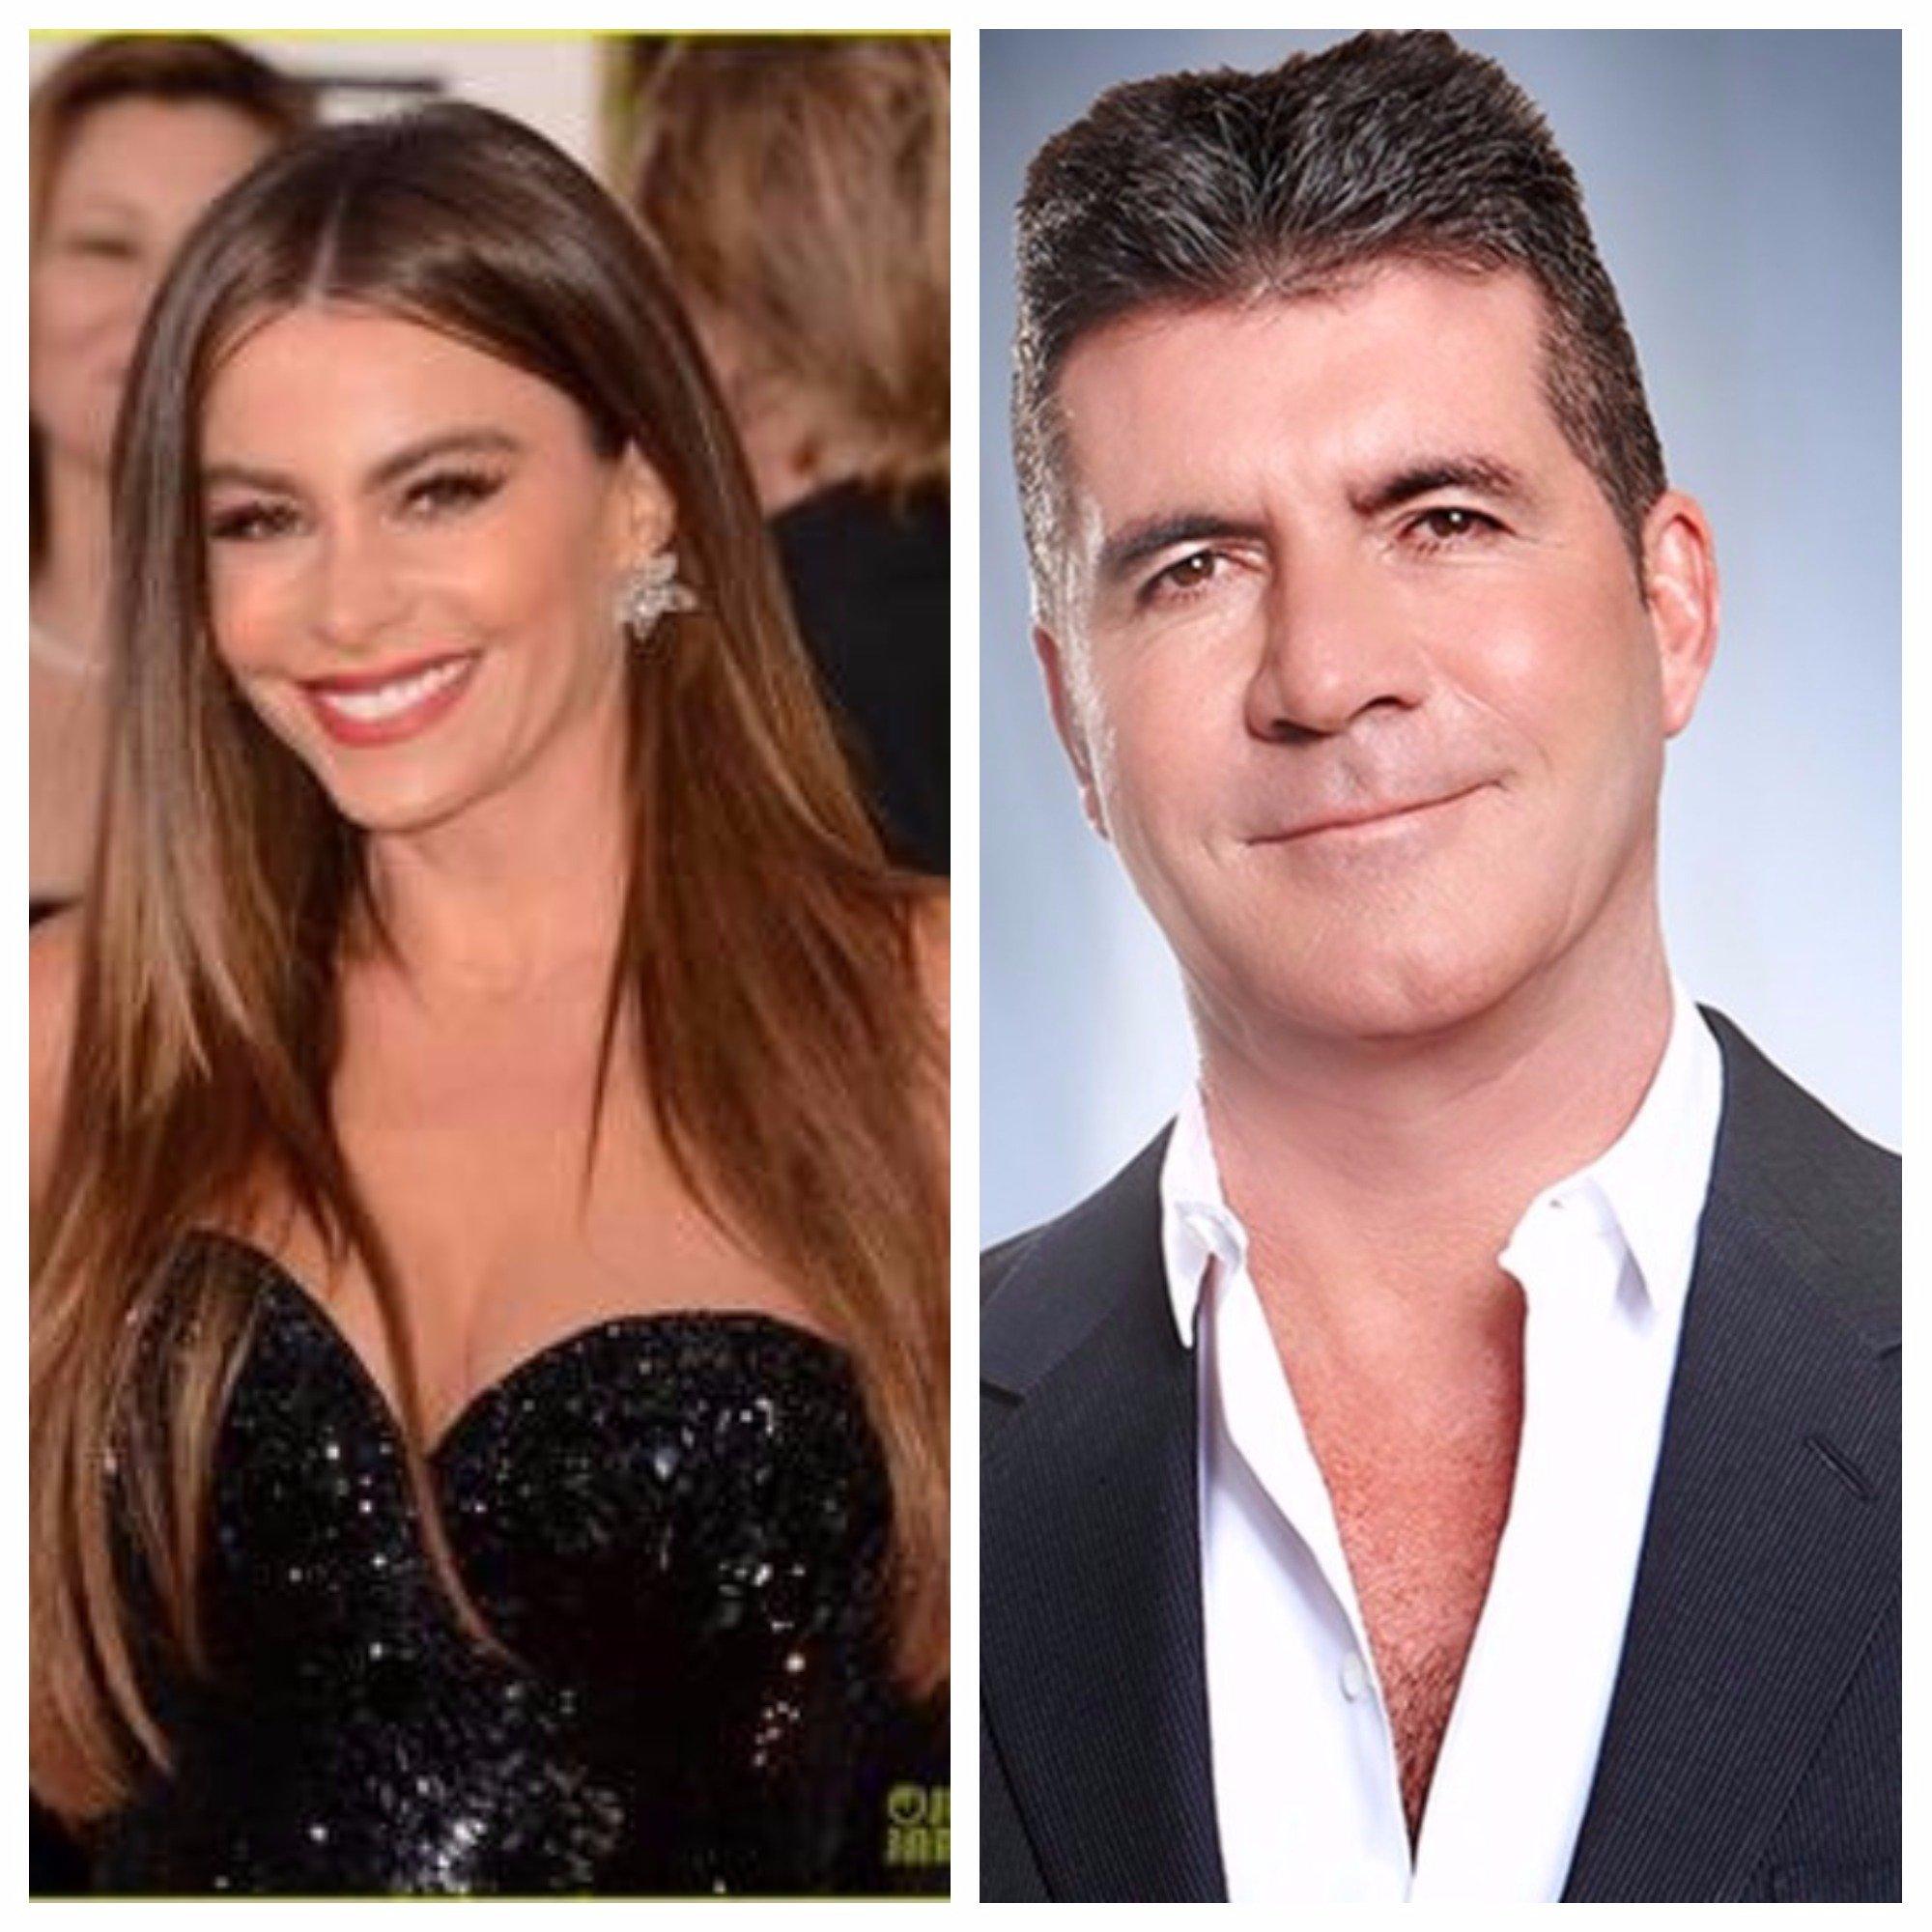 sofia vergara wants simon cowell to join modern family